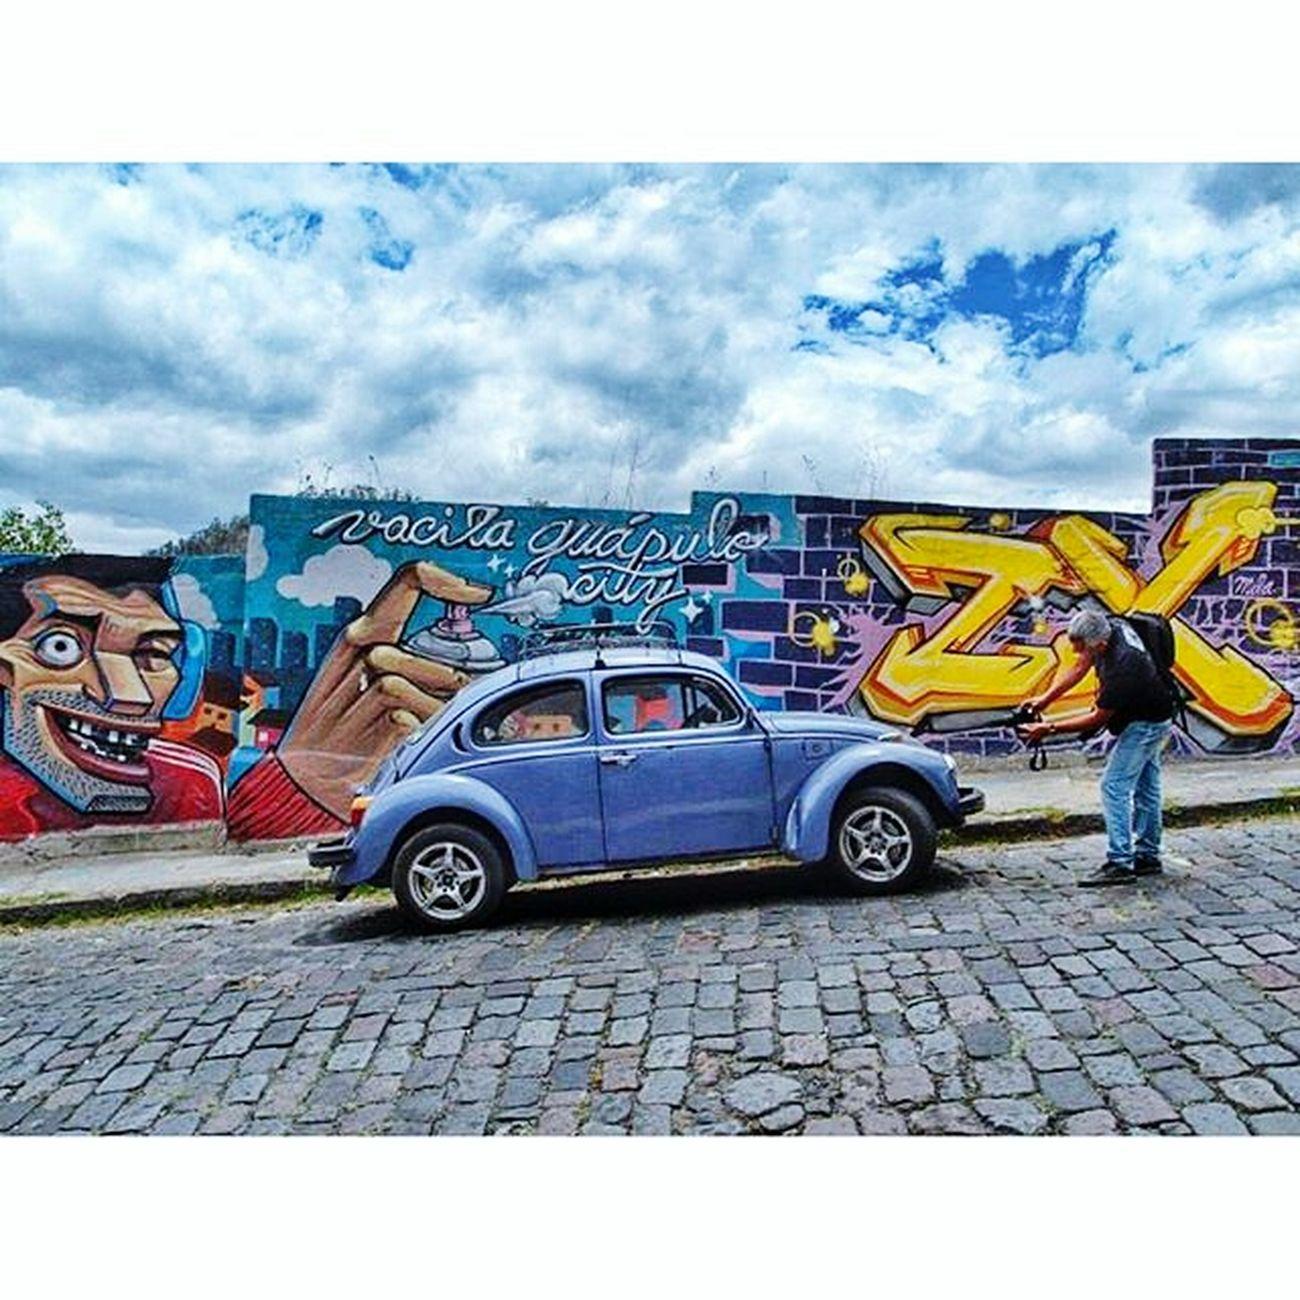 Guápulo City Guapulo Quito Ecuador Pichirilo Escarabajo Ride Streetart Street Art Graffiti Wall Art Colour Of Life The Street Photographer - 2017 EyeEm Awards Let's Go. Together.